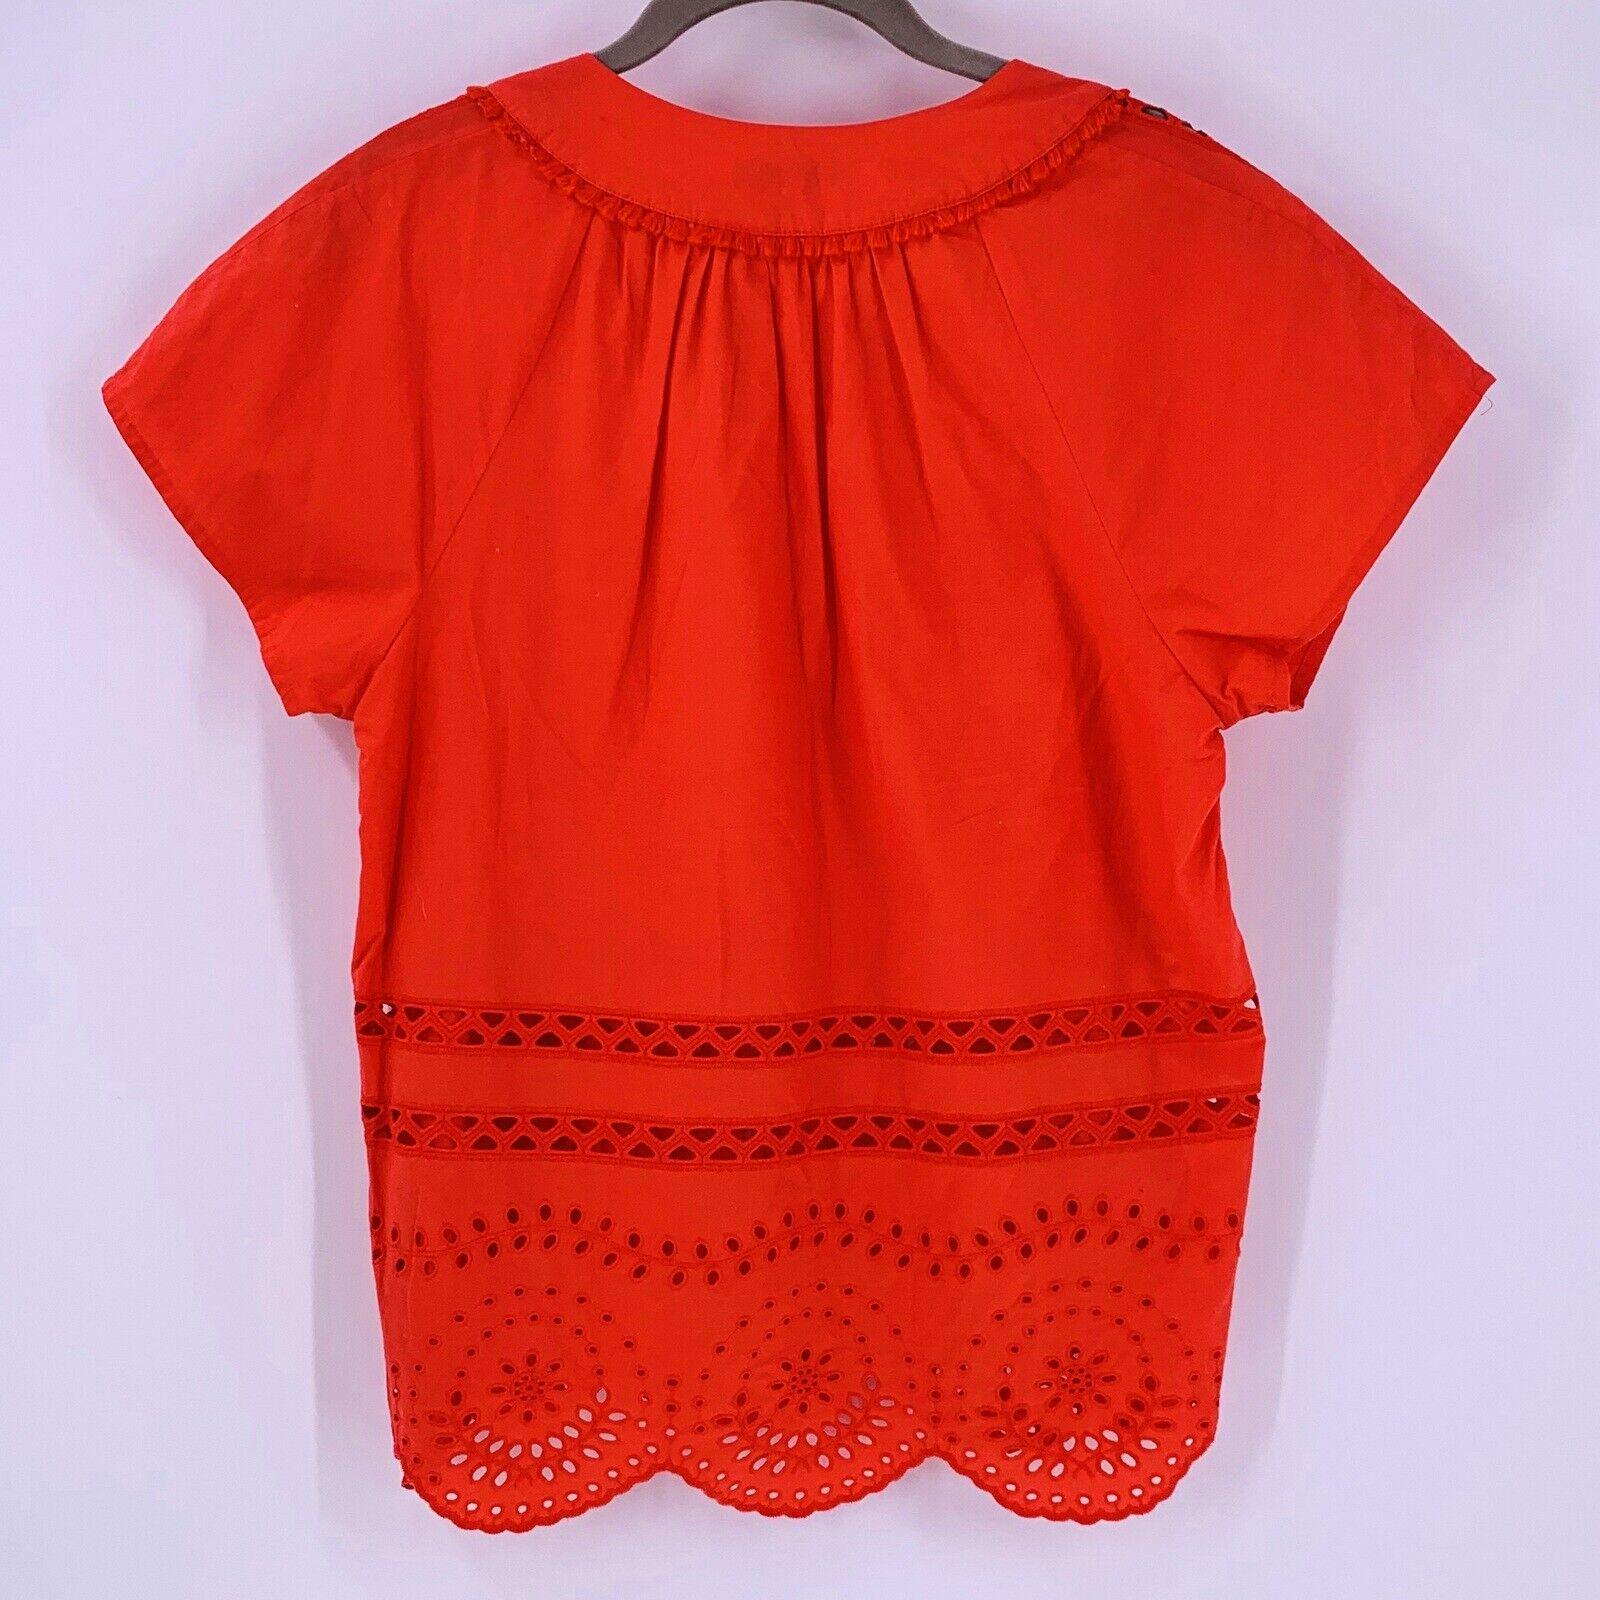 Madewell Orange Cotton Eyelet Angelica Top Size S… - image 7